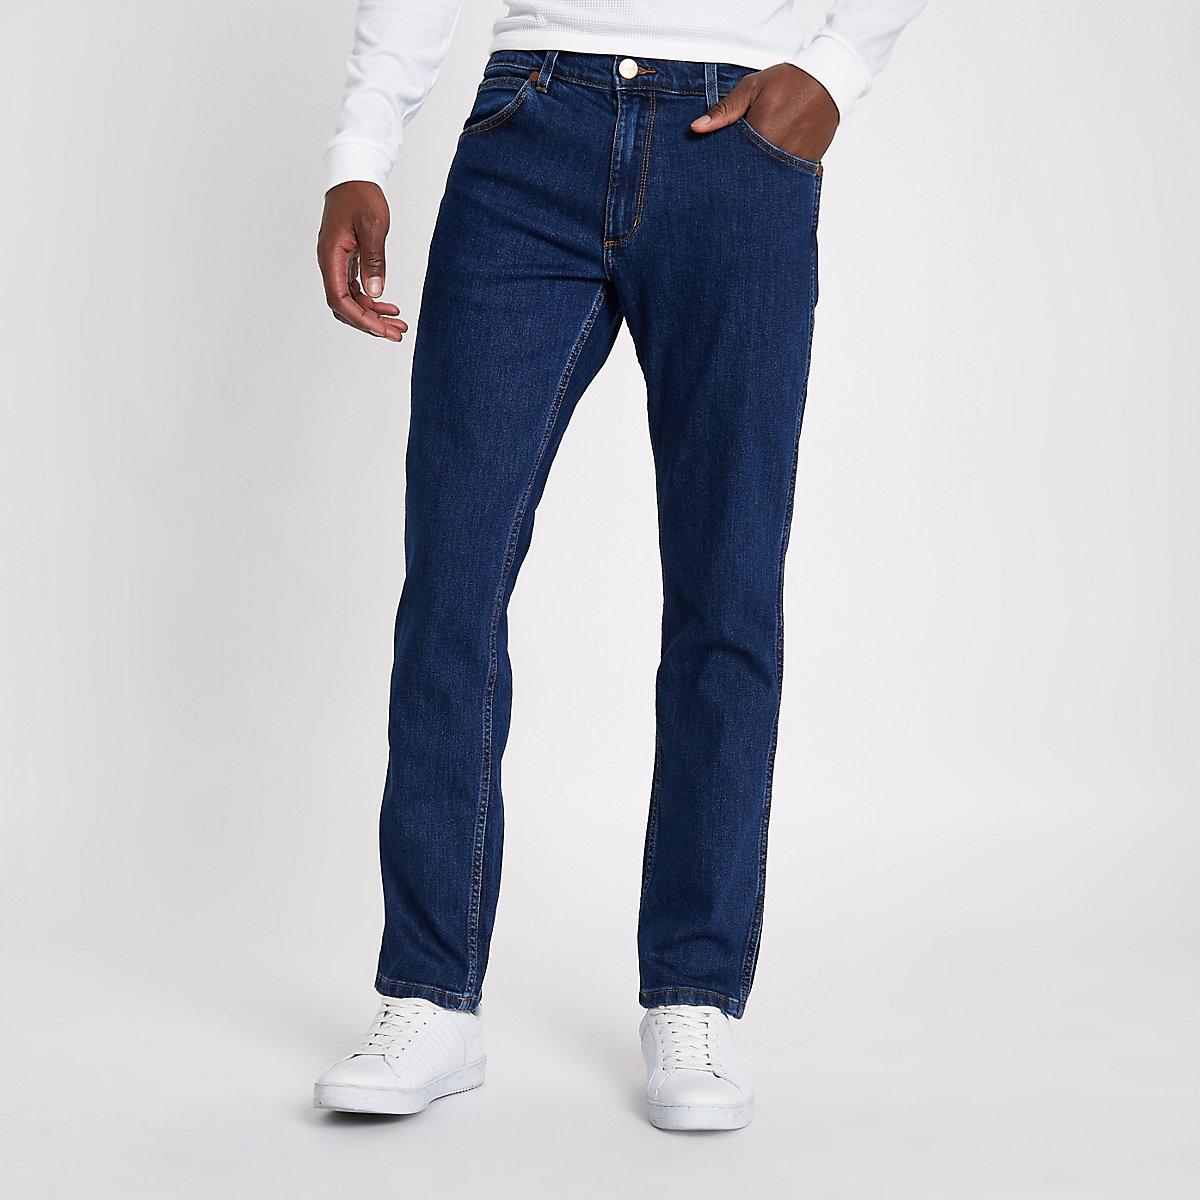 Wrangler mid blue Greensboro straight jeans